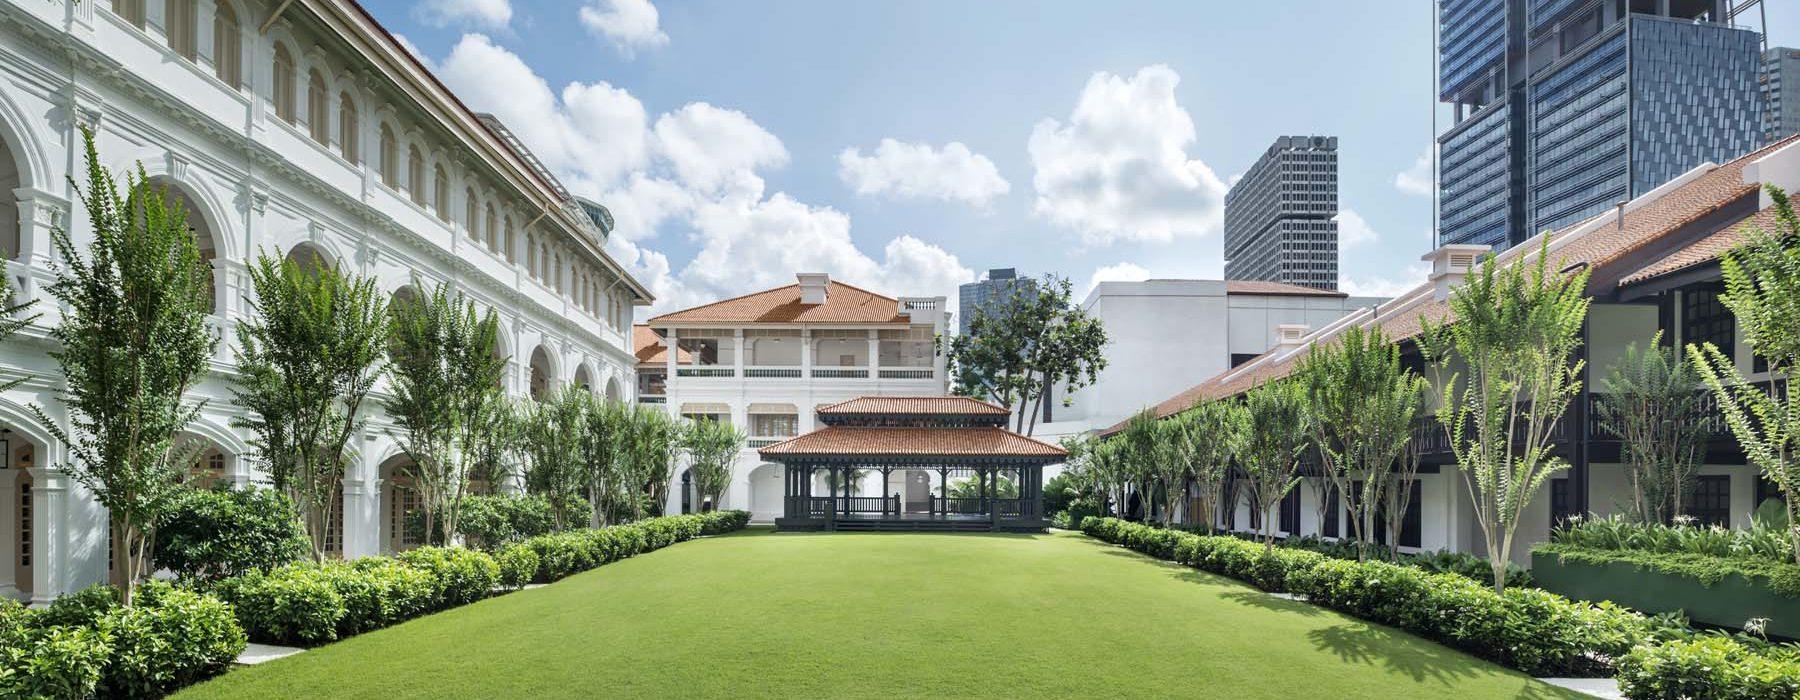 Raffles Singapore - Meetings & Events